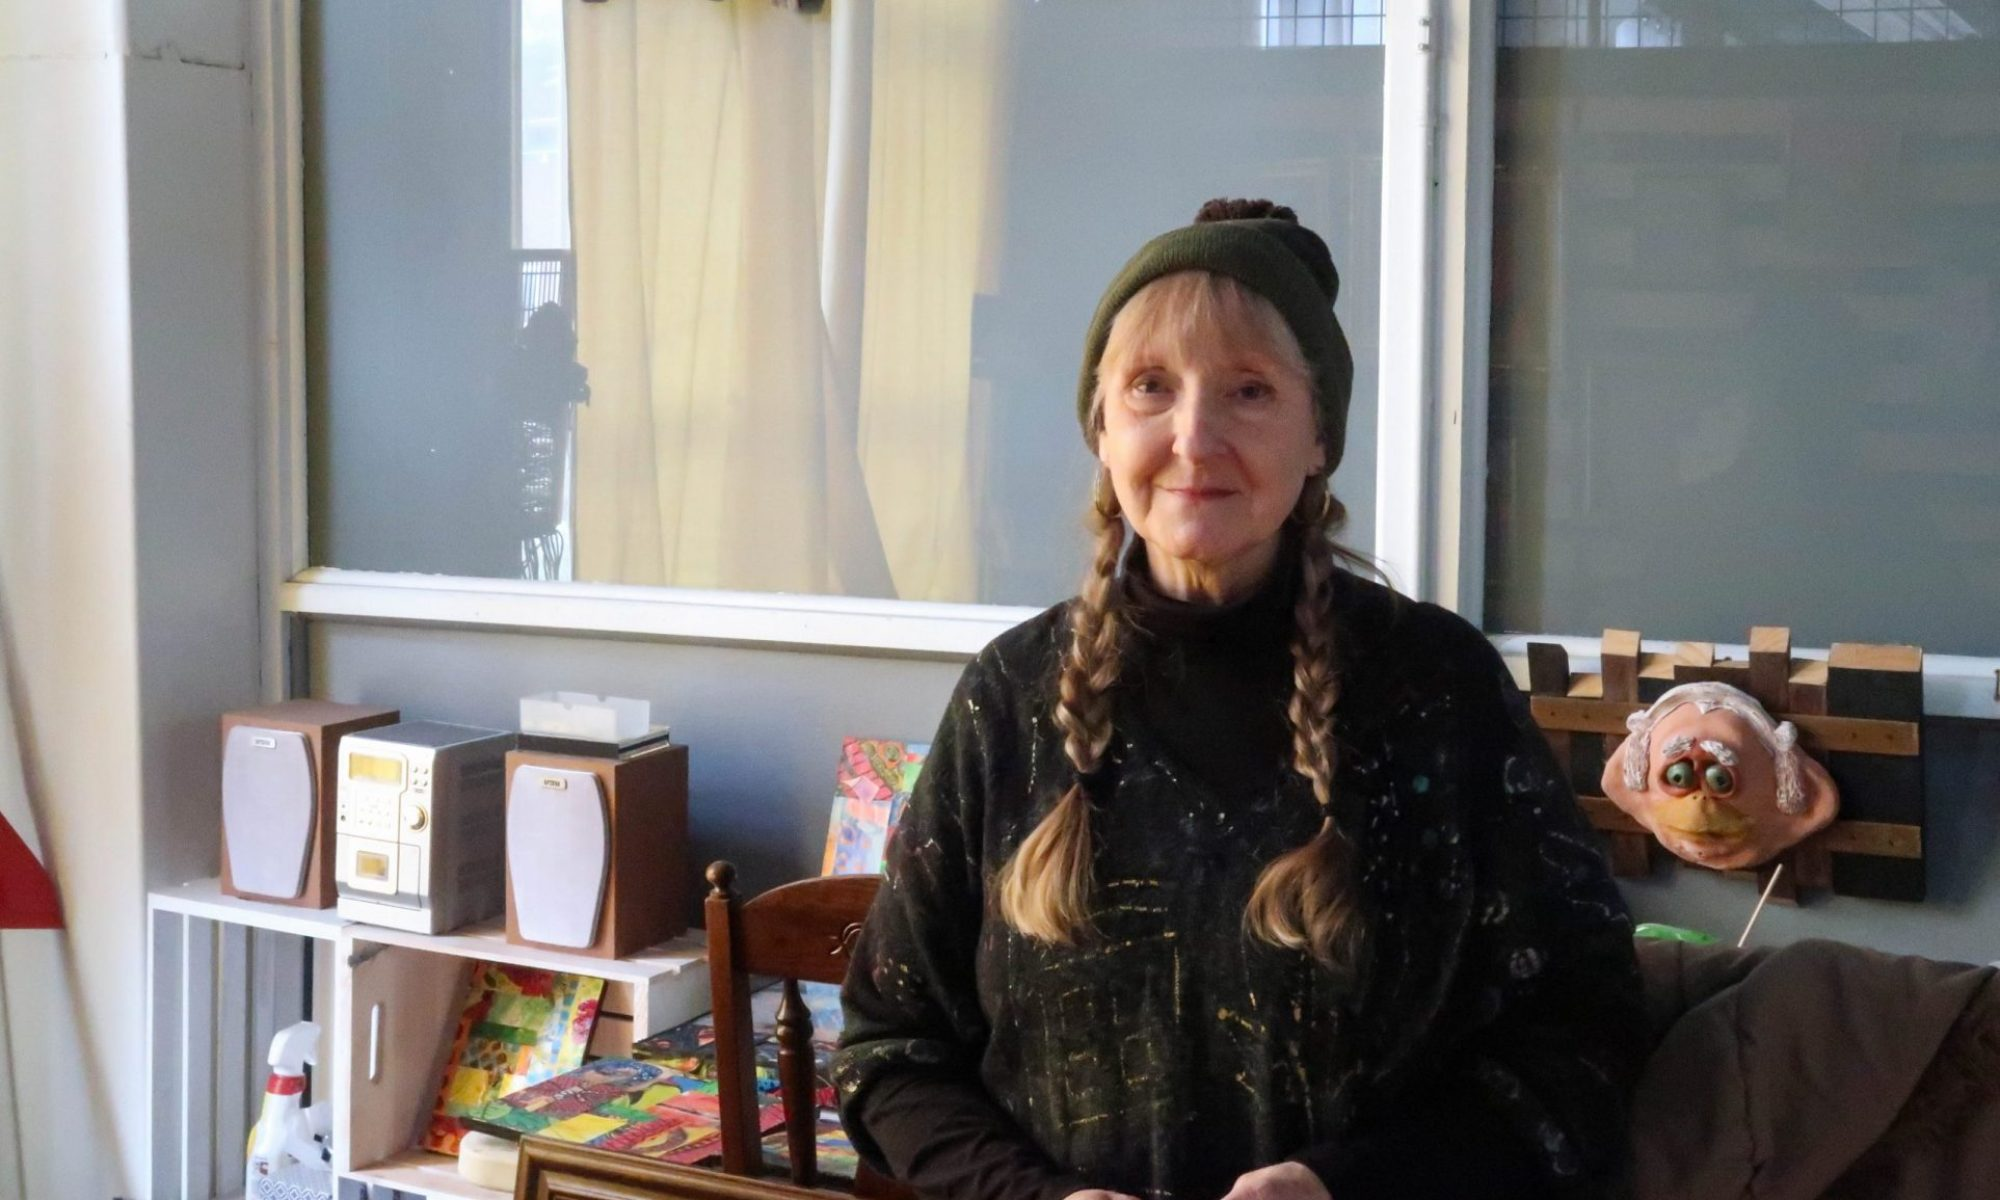 Nancy Ann Sturdevant